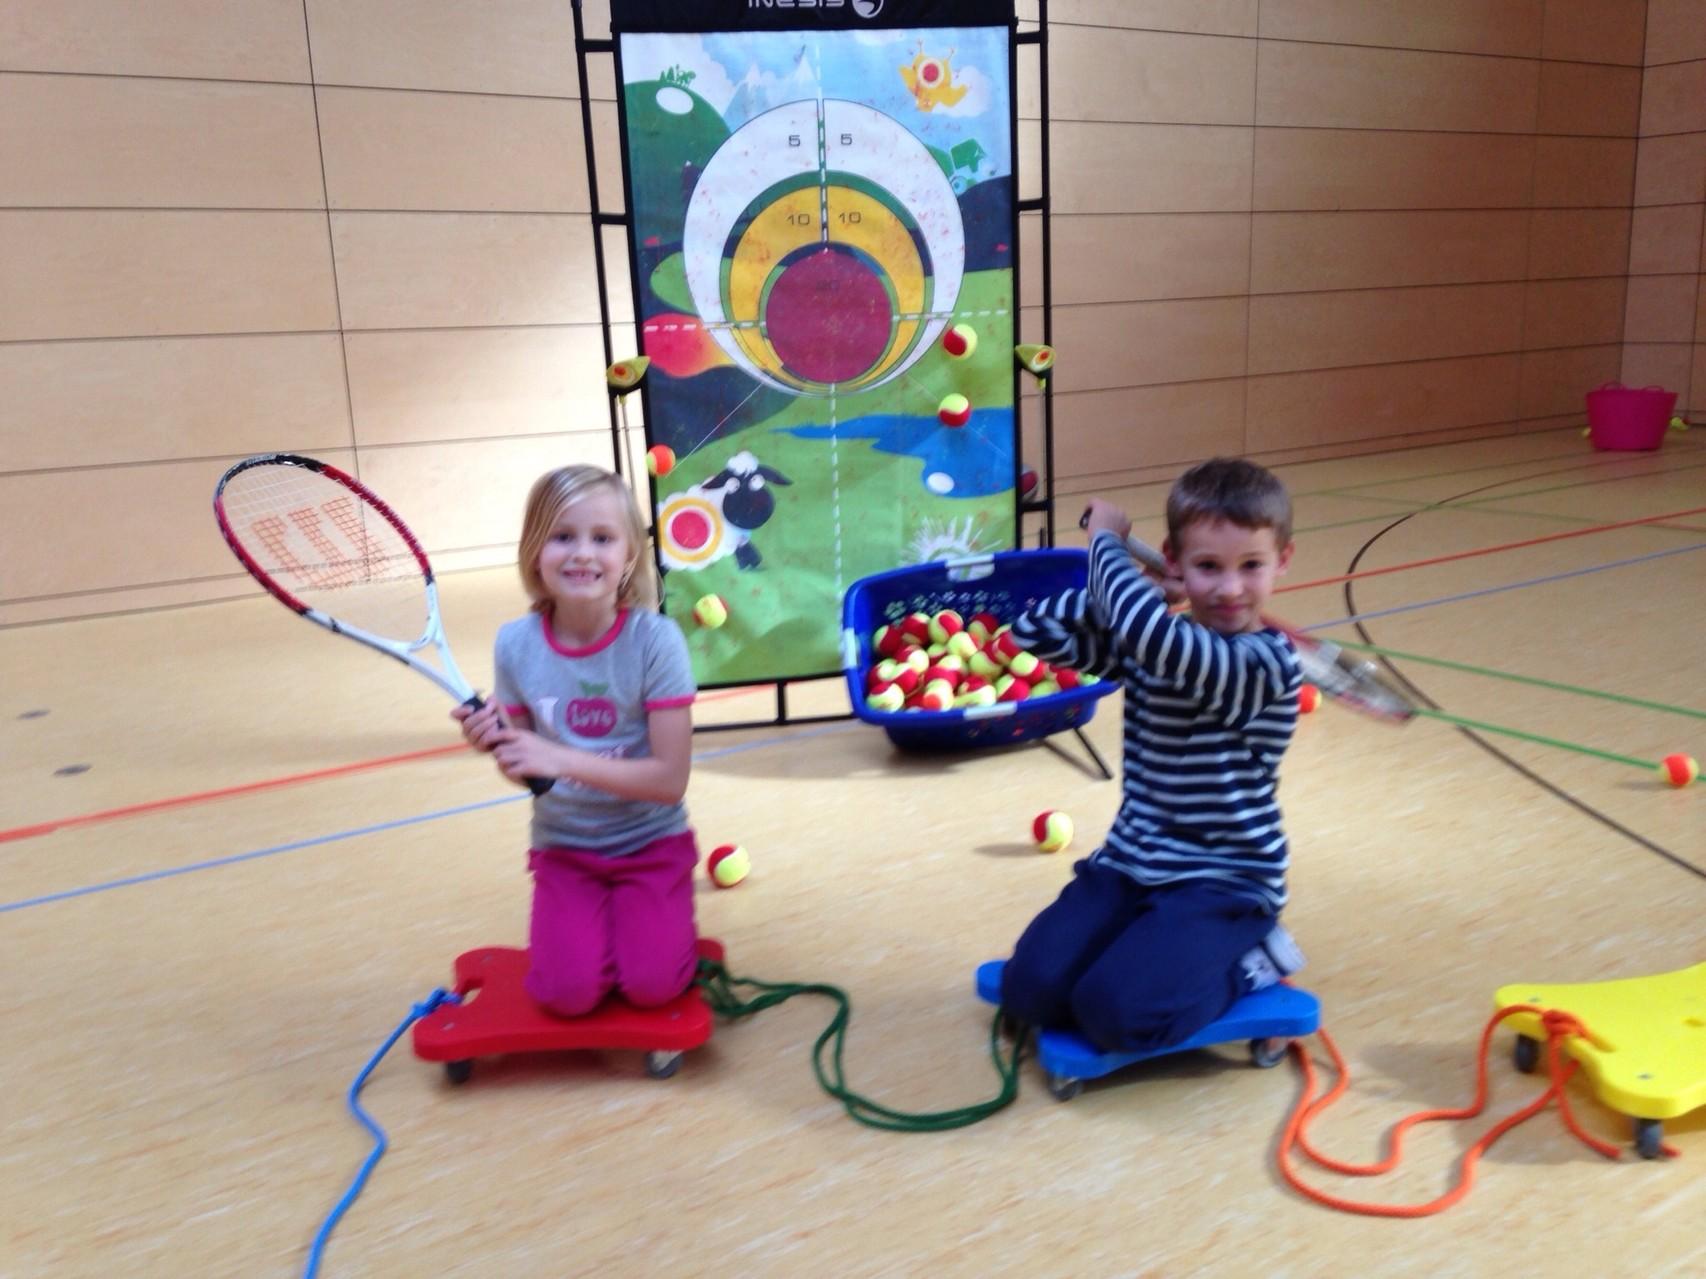 Tennistraining Jugend Wintersaison 2013/2014